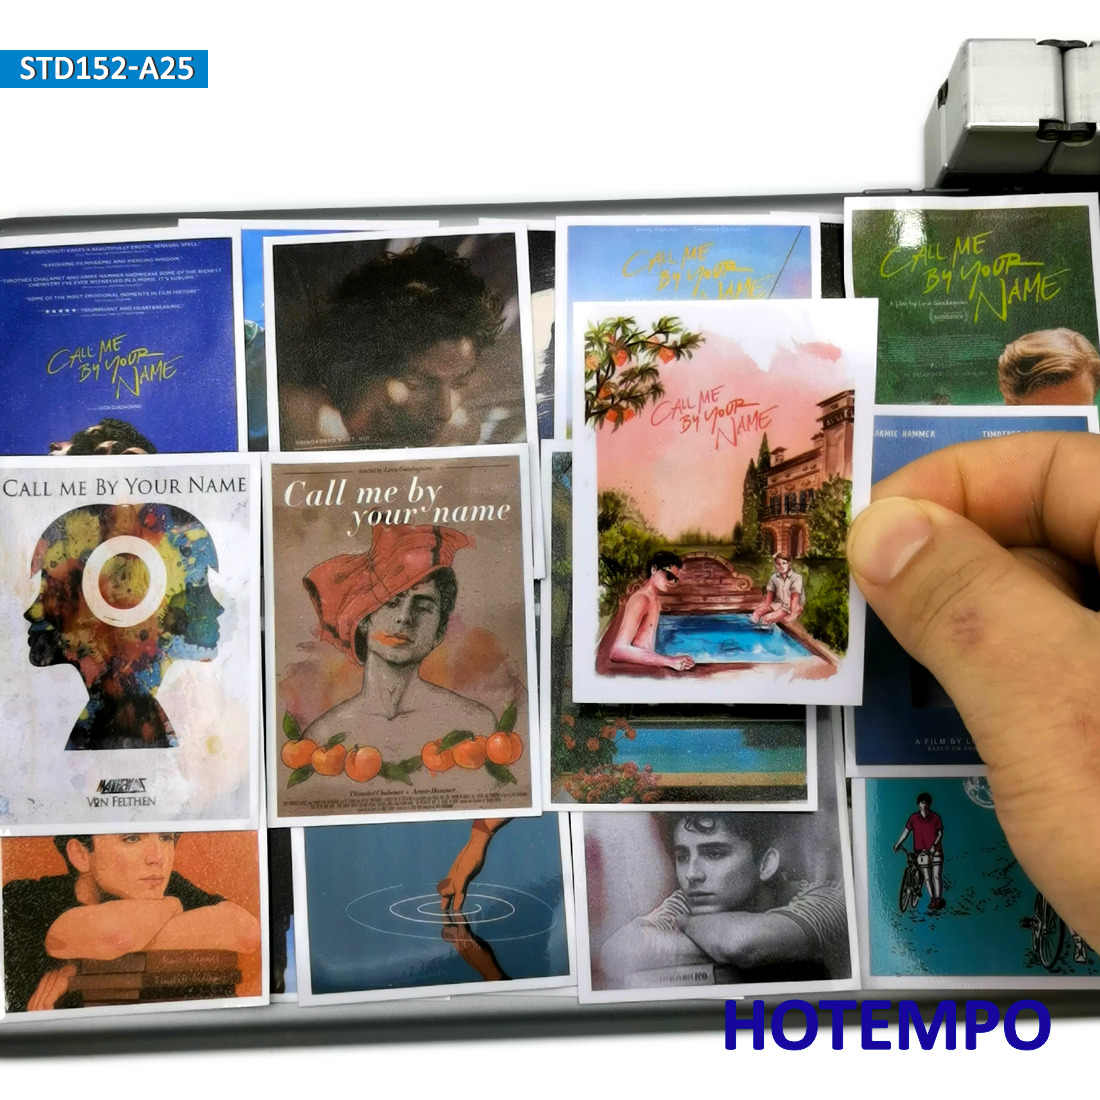 25 PCS ภาพยนตร์ Call Me โดยของคุณชื่อ Art โปสเตอร์สไตล์สติกเกอร์สำหรับโทรศัพท์มือถือแล็ปท็อปกระเป๋าเดินทางสมุดภาพแฟชั่นสติกเกอร์รูปลอก